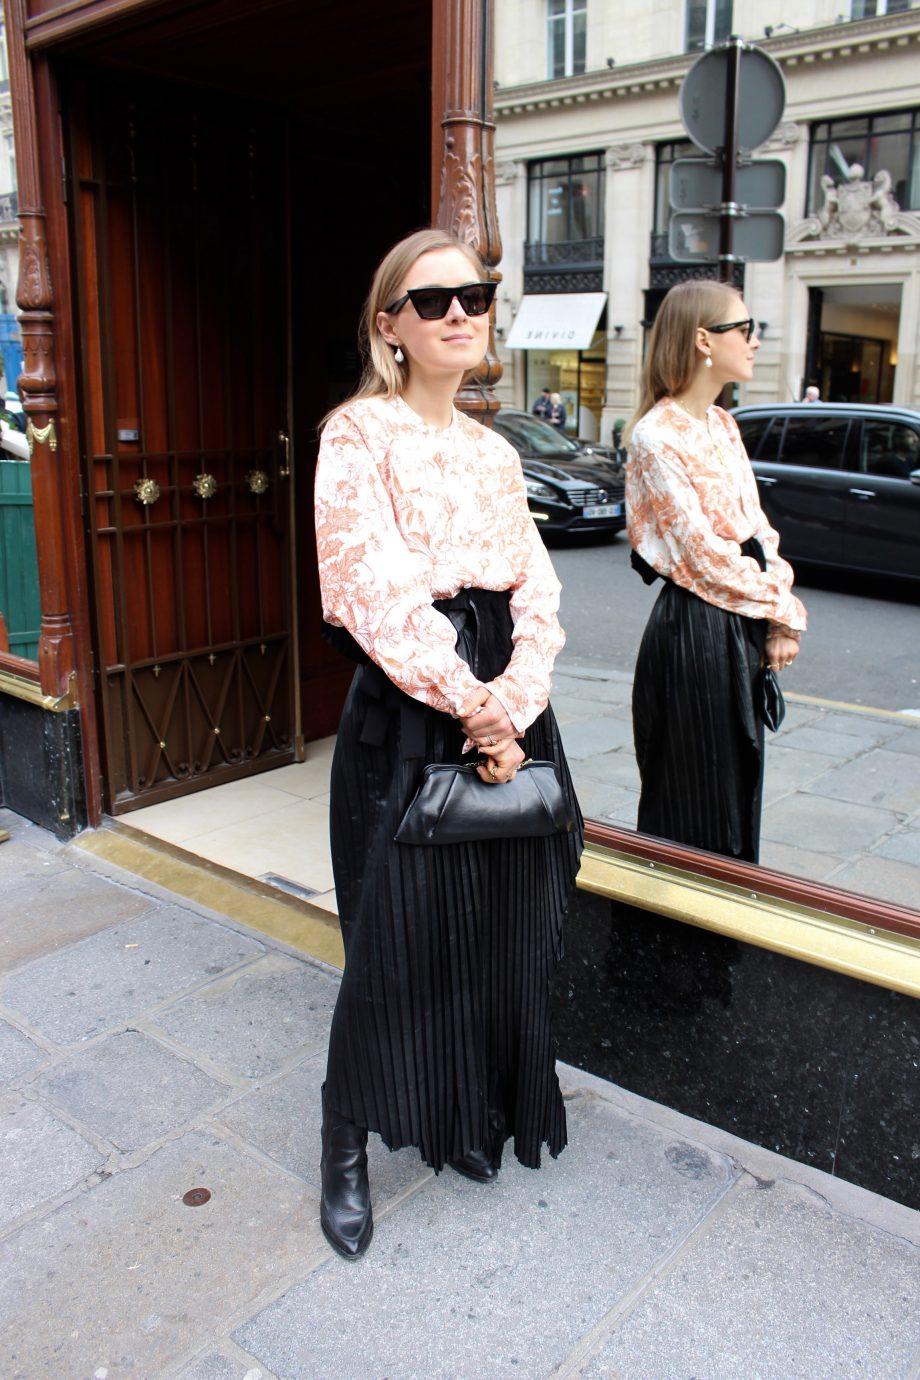 Nobi Talai Leather Skirt |18.03.2018